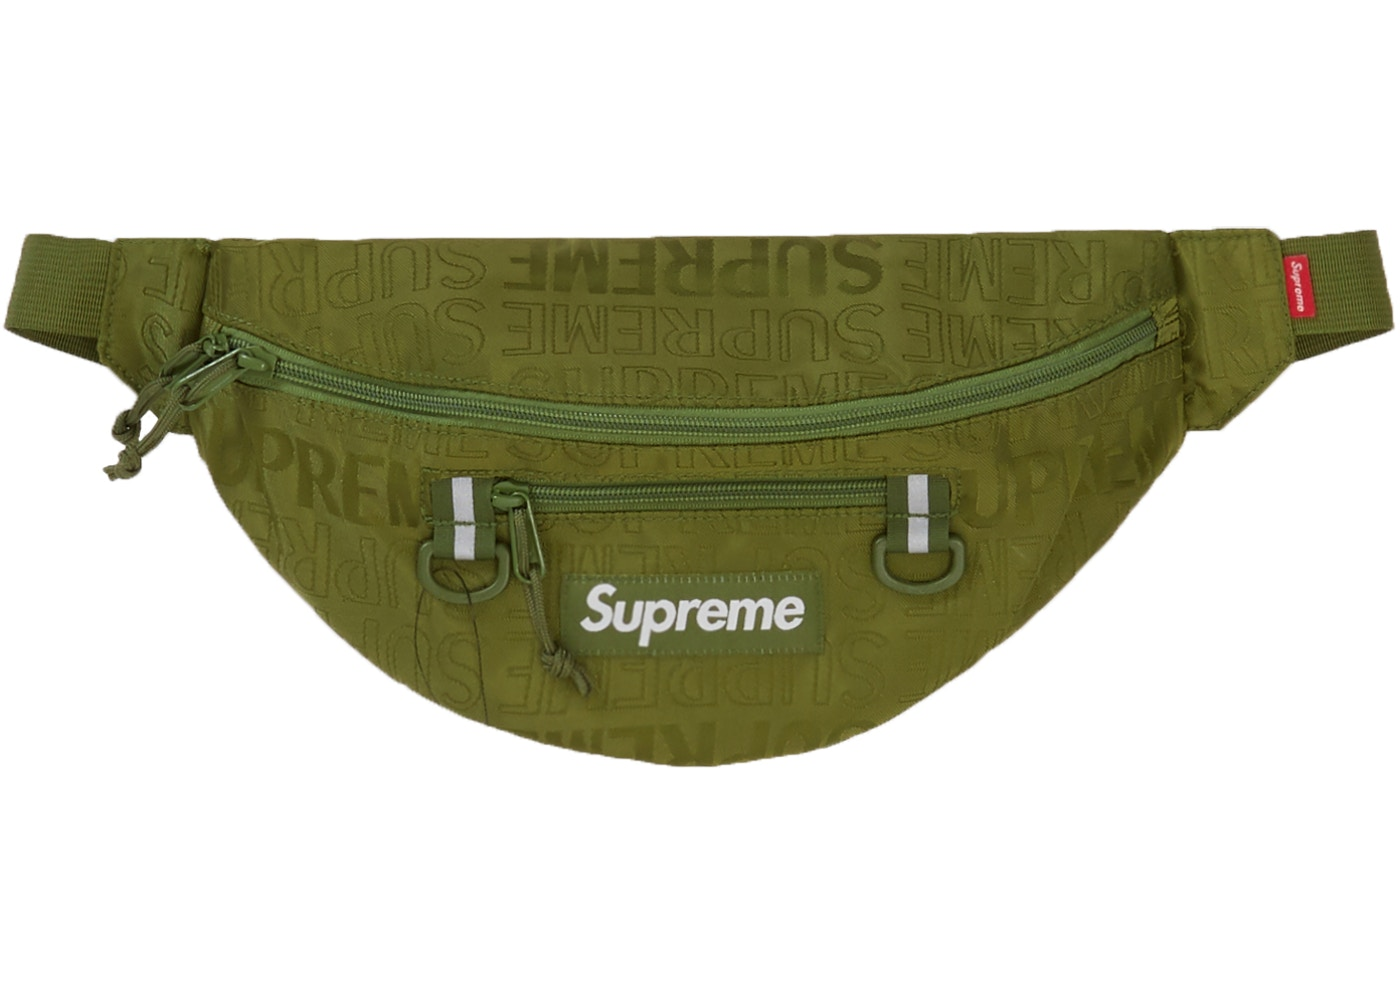 c6ffdfe034eb Supreme Bags - Buy & Sell Streetwear